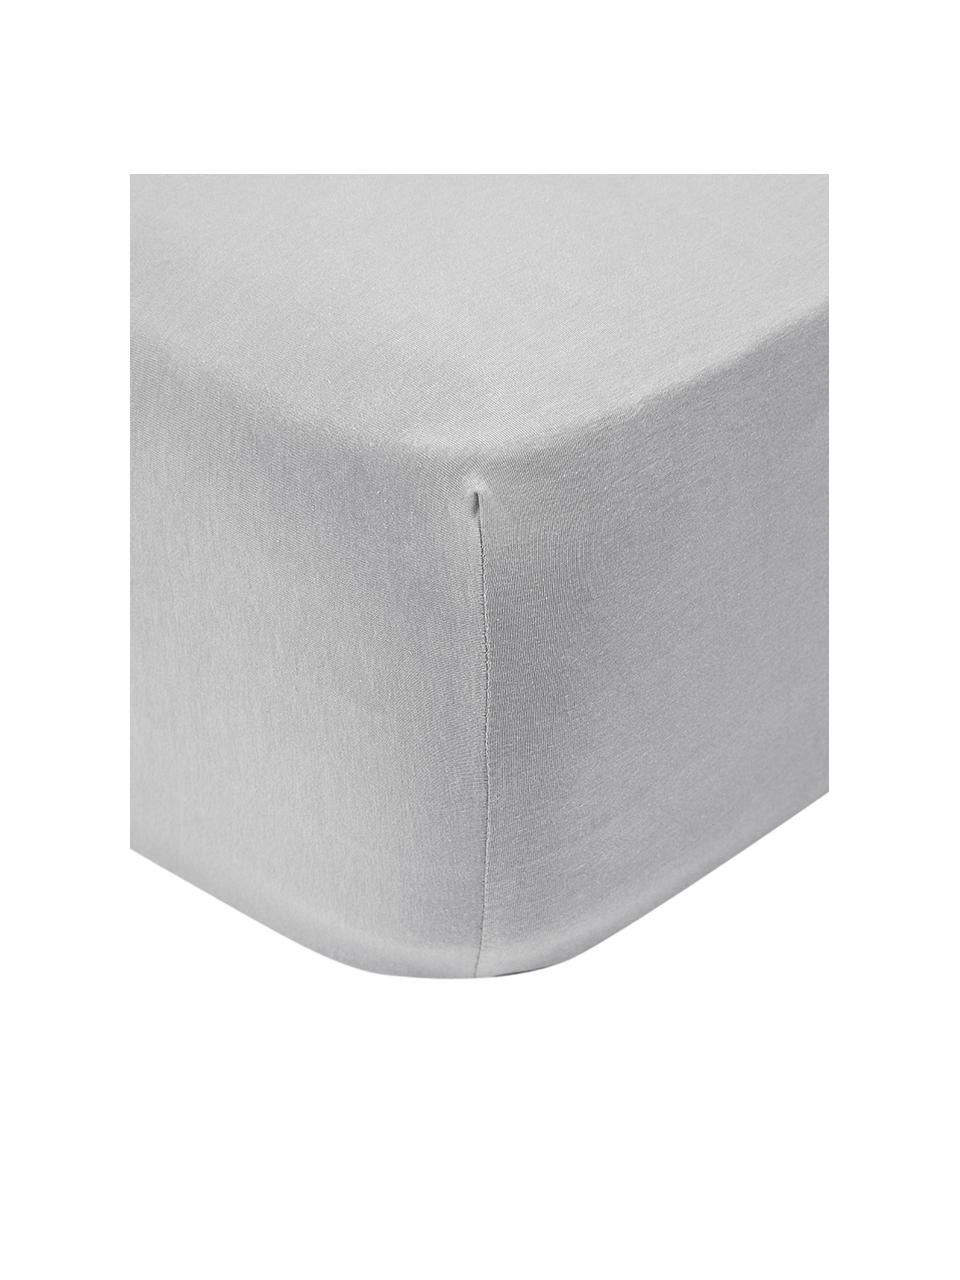 Lenzuolo con angoli in jersey-elastan grigio chiaro Lara, 95% cotone, 5% elastan, Grigio chiaro, Larg. 140 x Lung. 200 cm